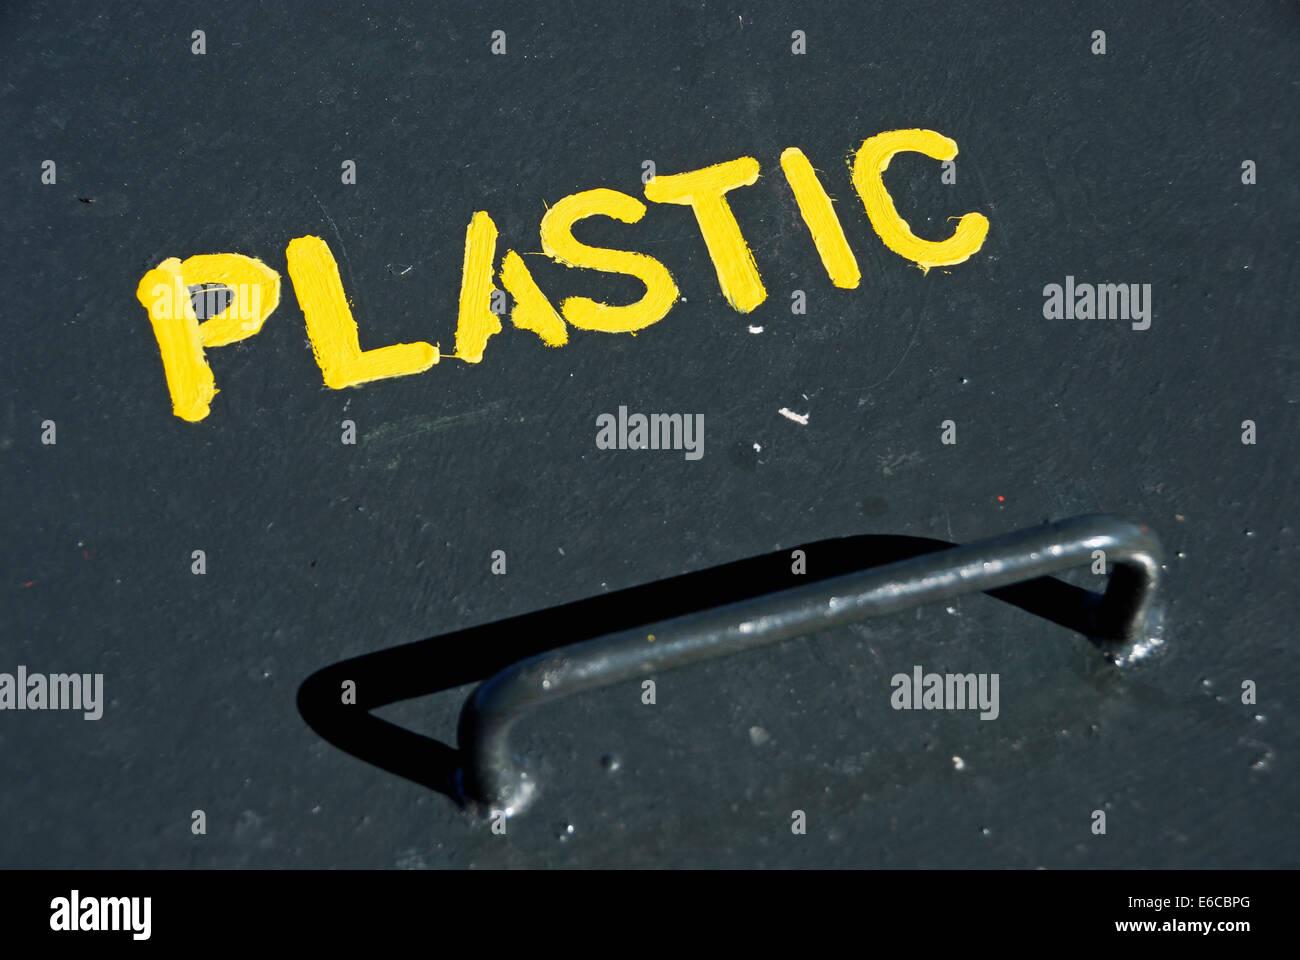 Plastic recycling bin top - Stock Image